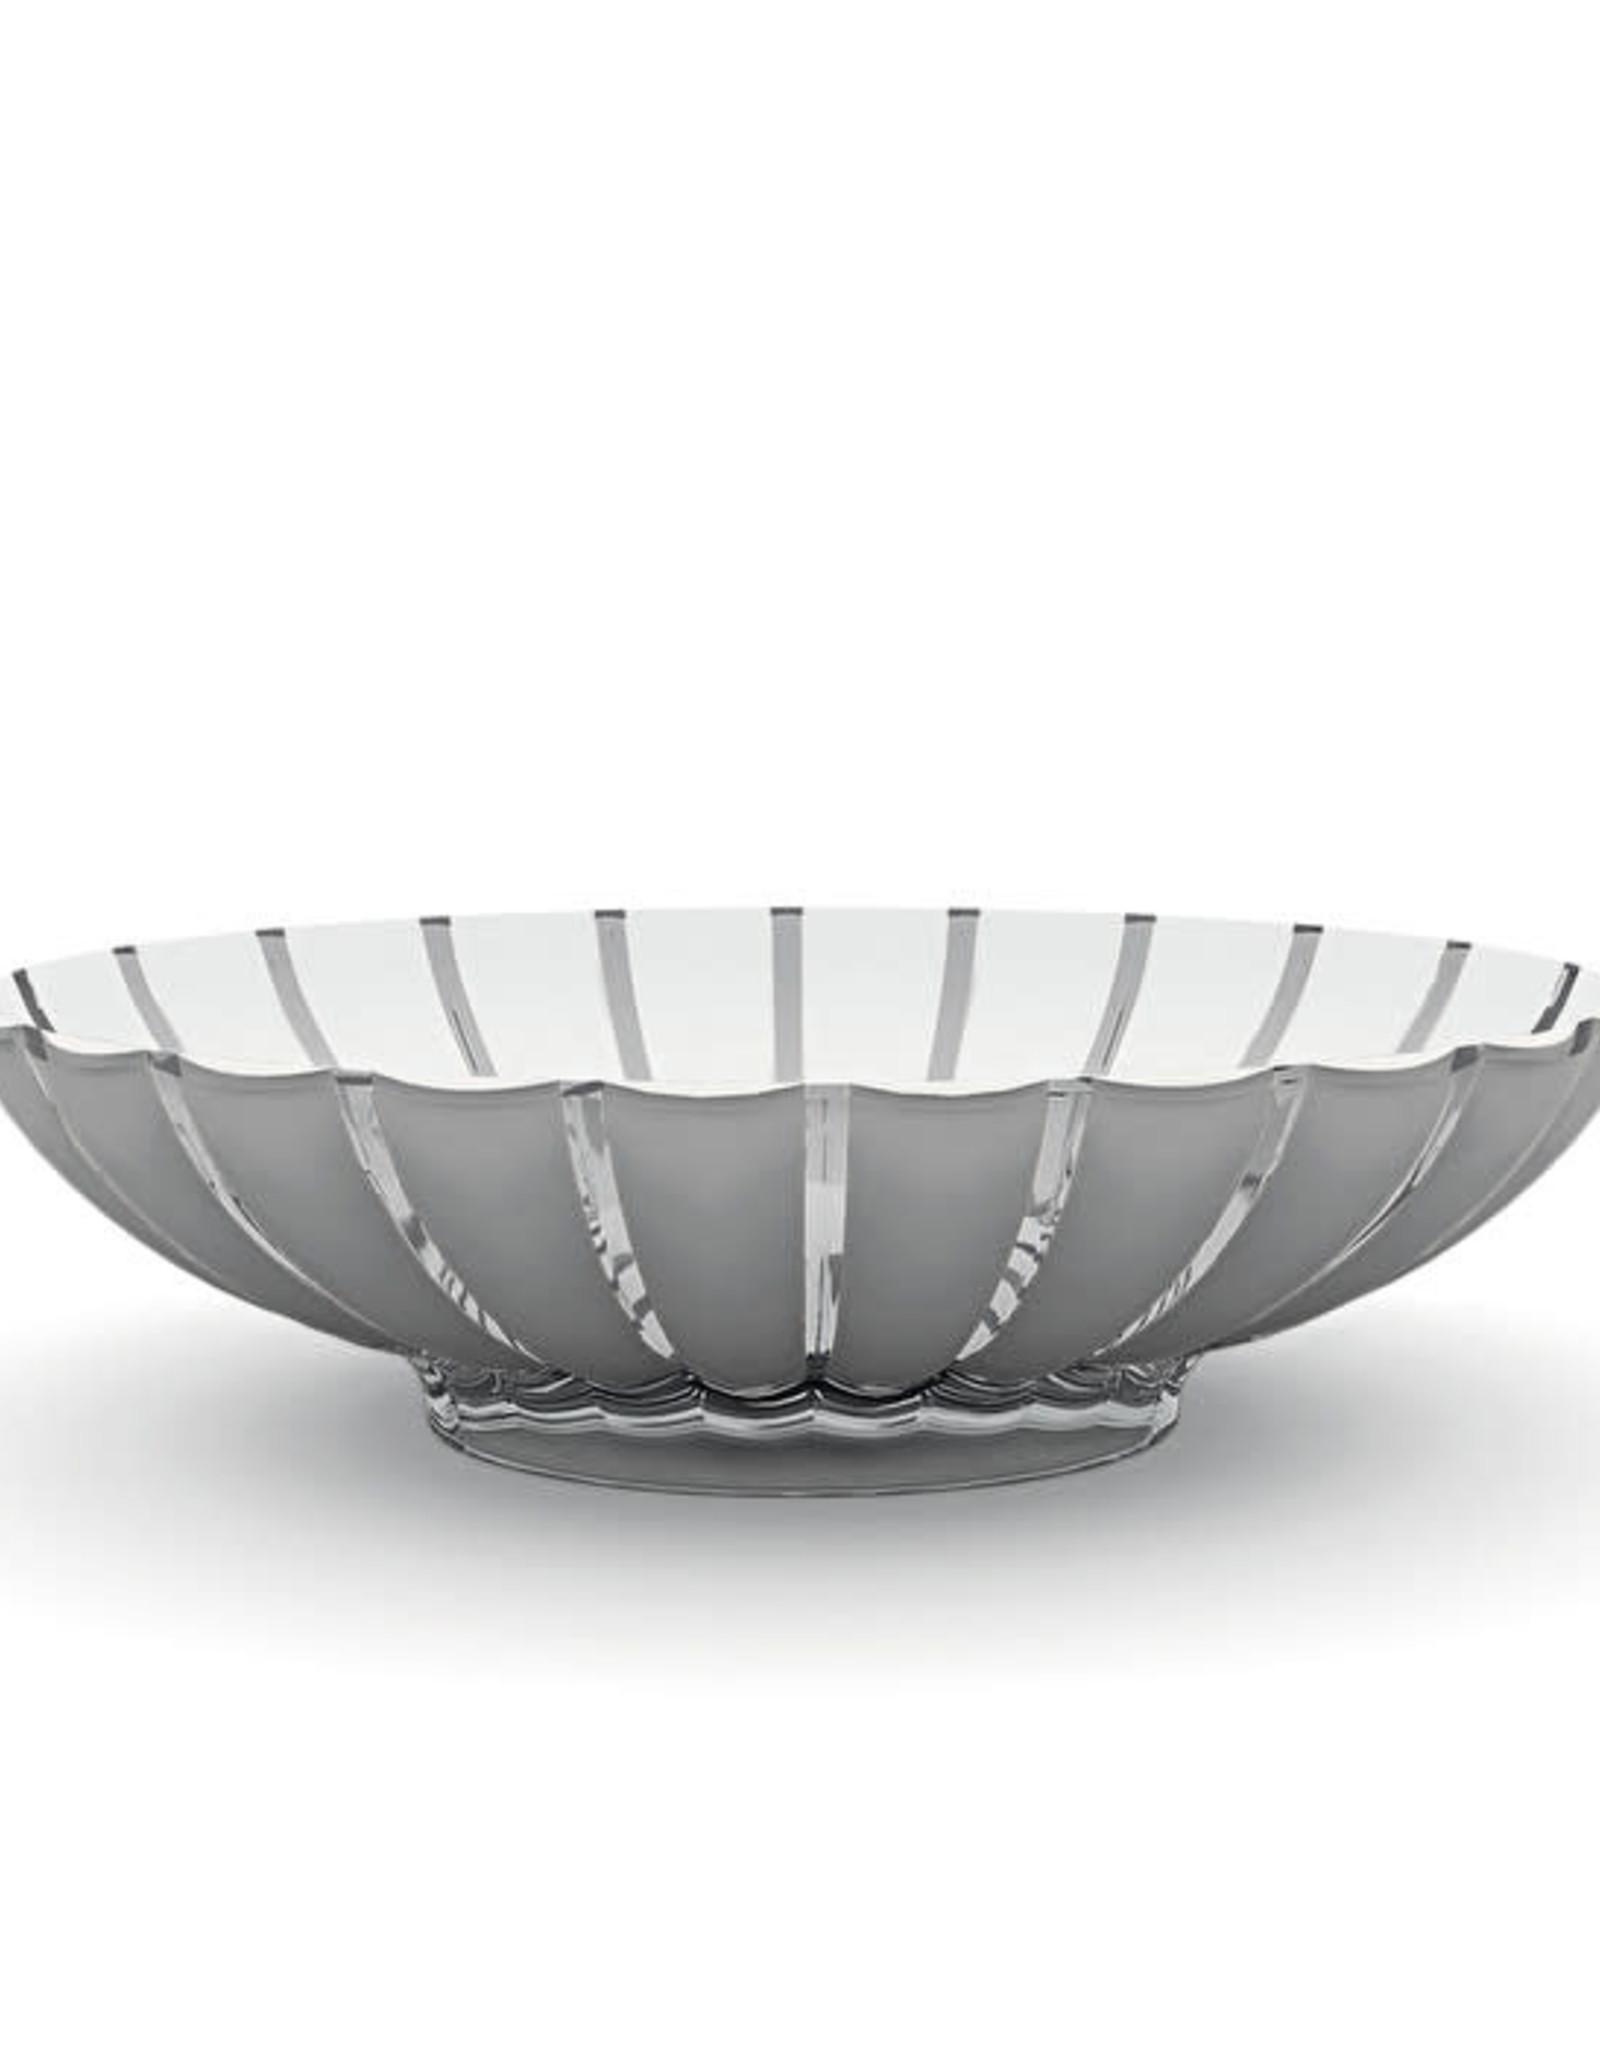 Guzzini Grace Centerpiece Fruit Bowl